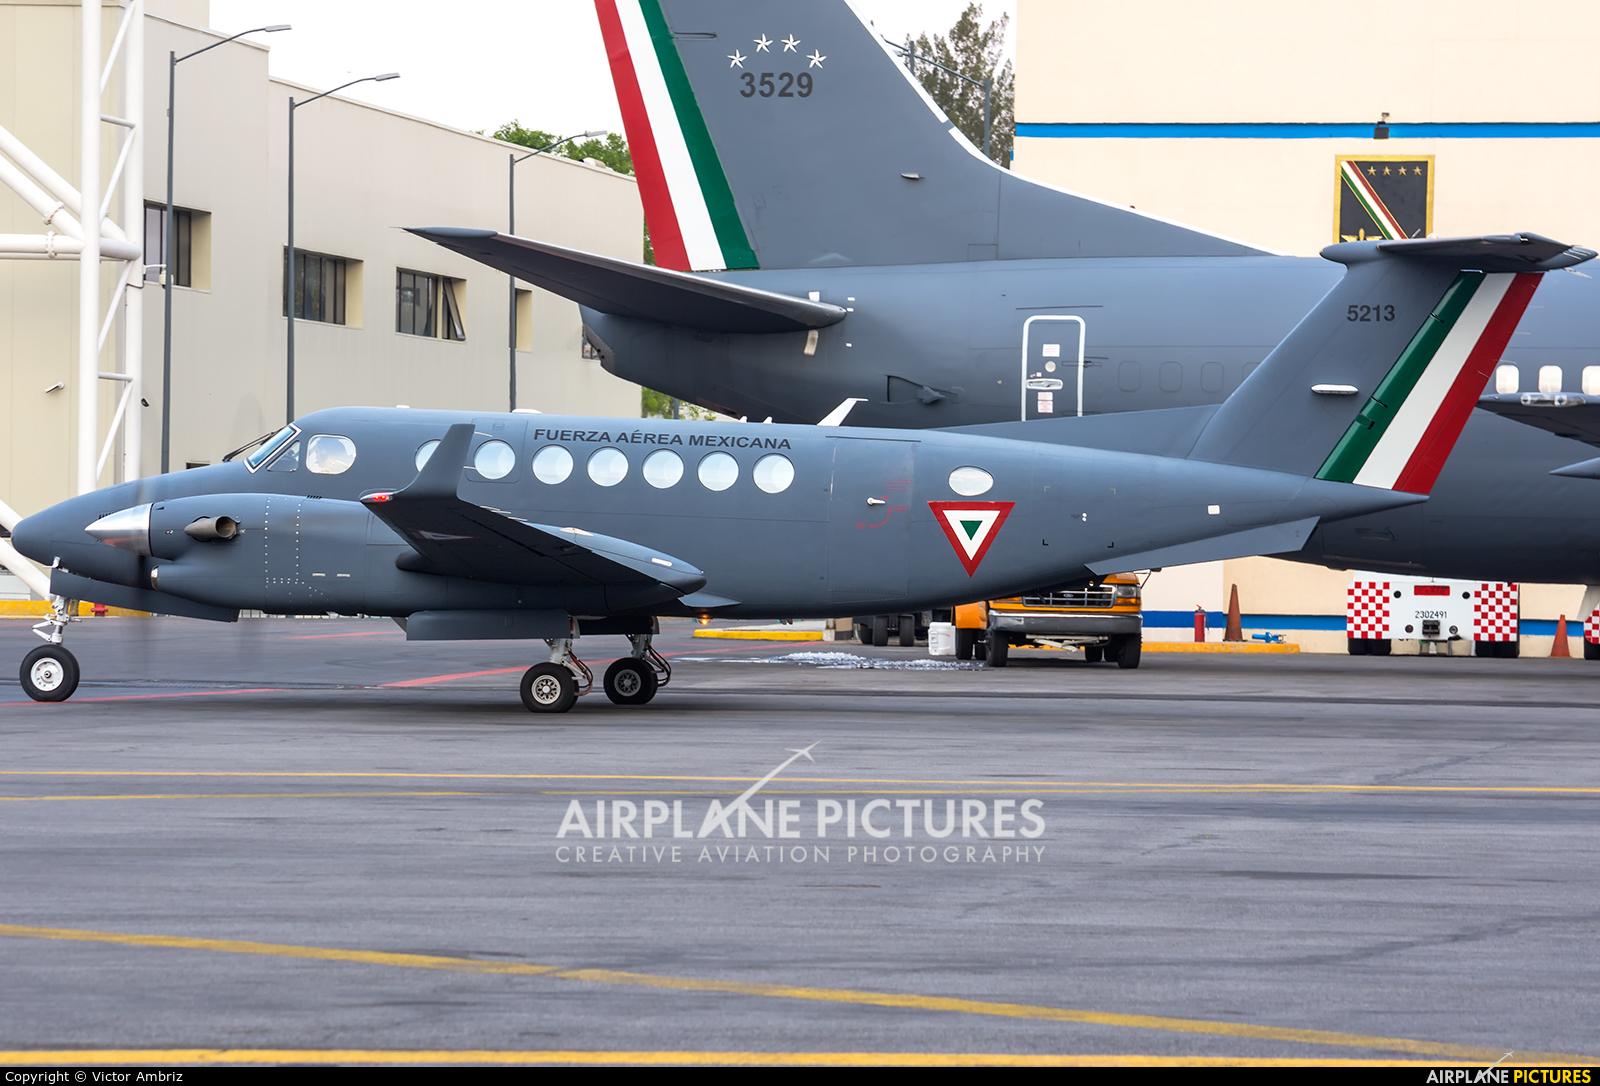 Mexico - Air Force 5813 aircraft at Mexico City - Licenciado Benito Juarez Intl